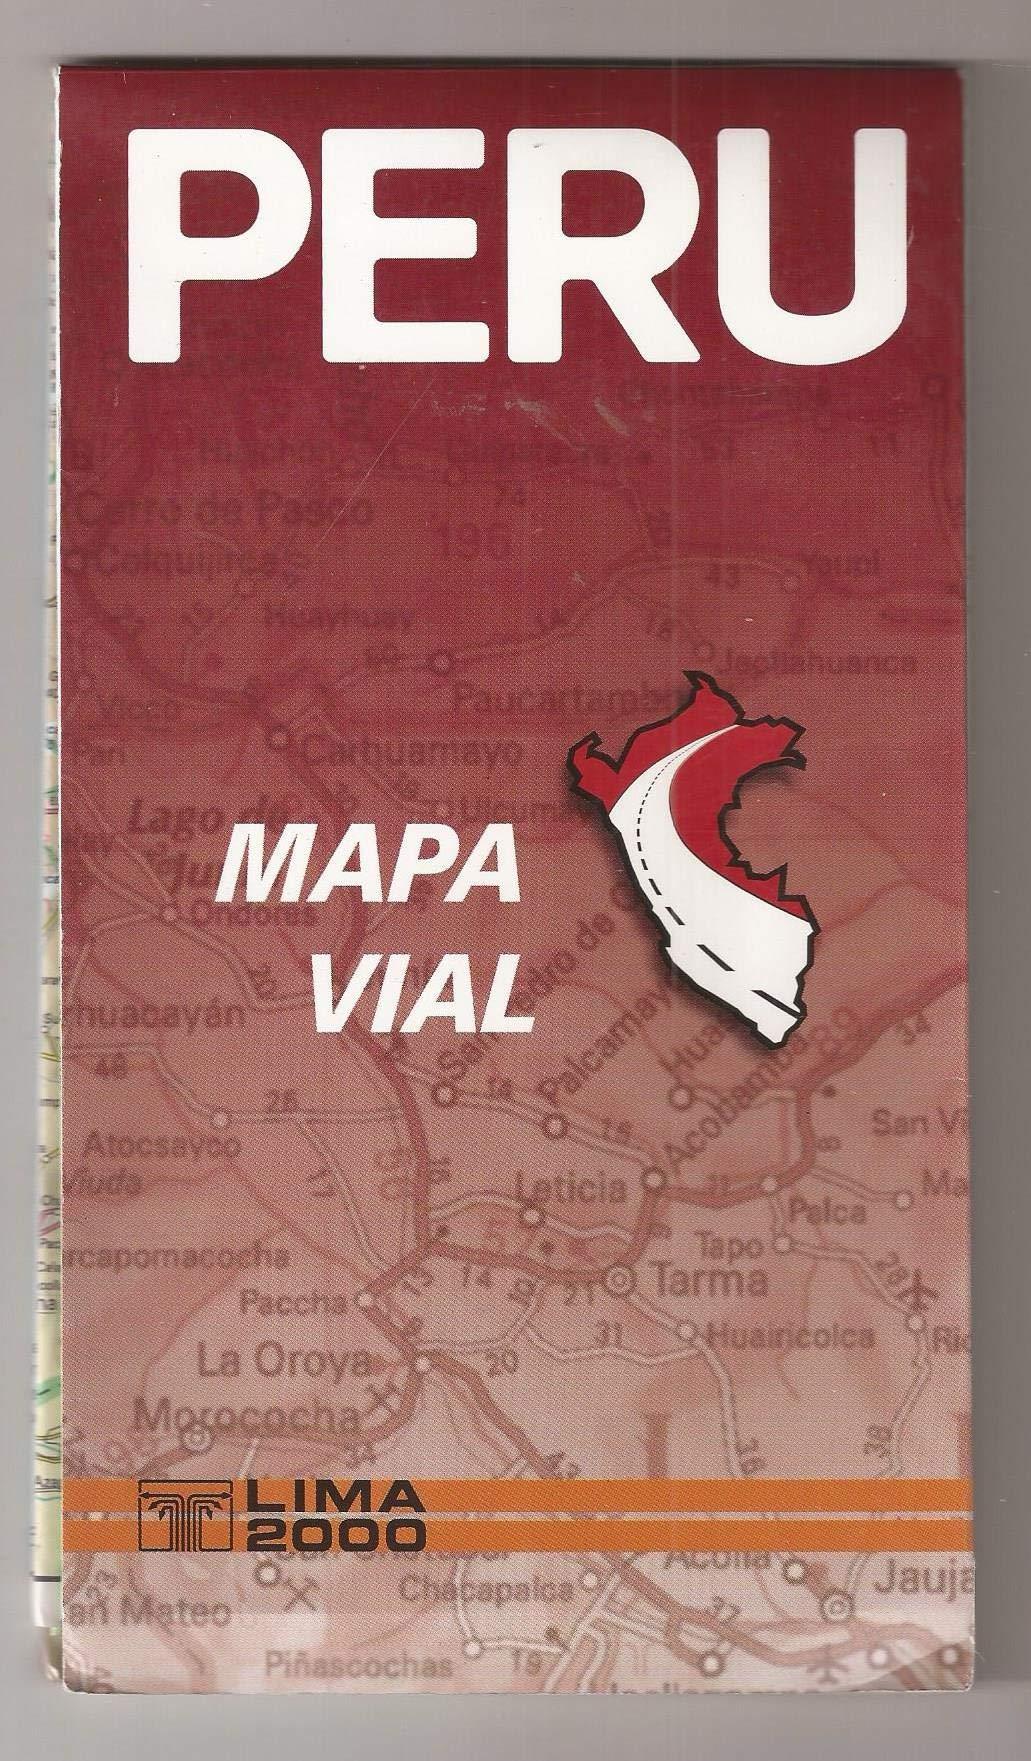 Peru Road Map with City Maps / Peru Mapa Vial con planos de ciudades ebook